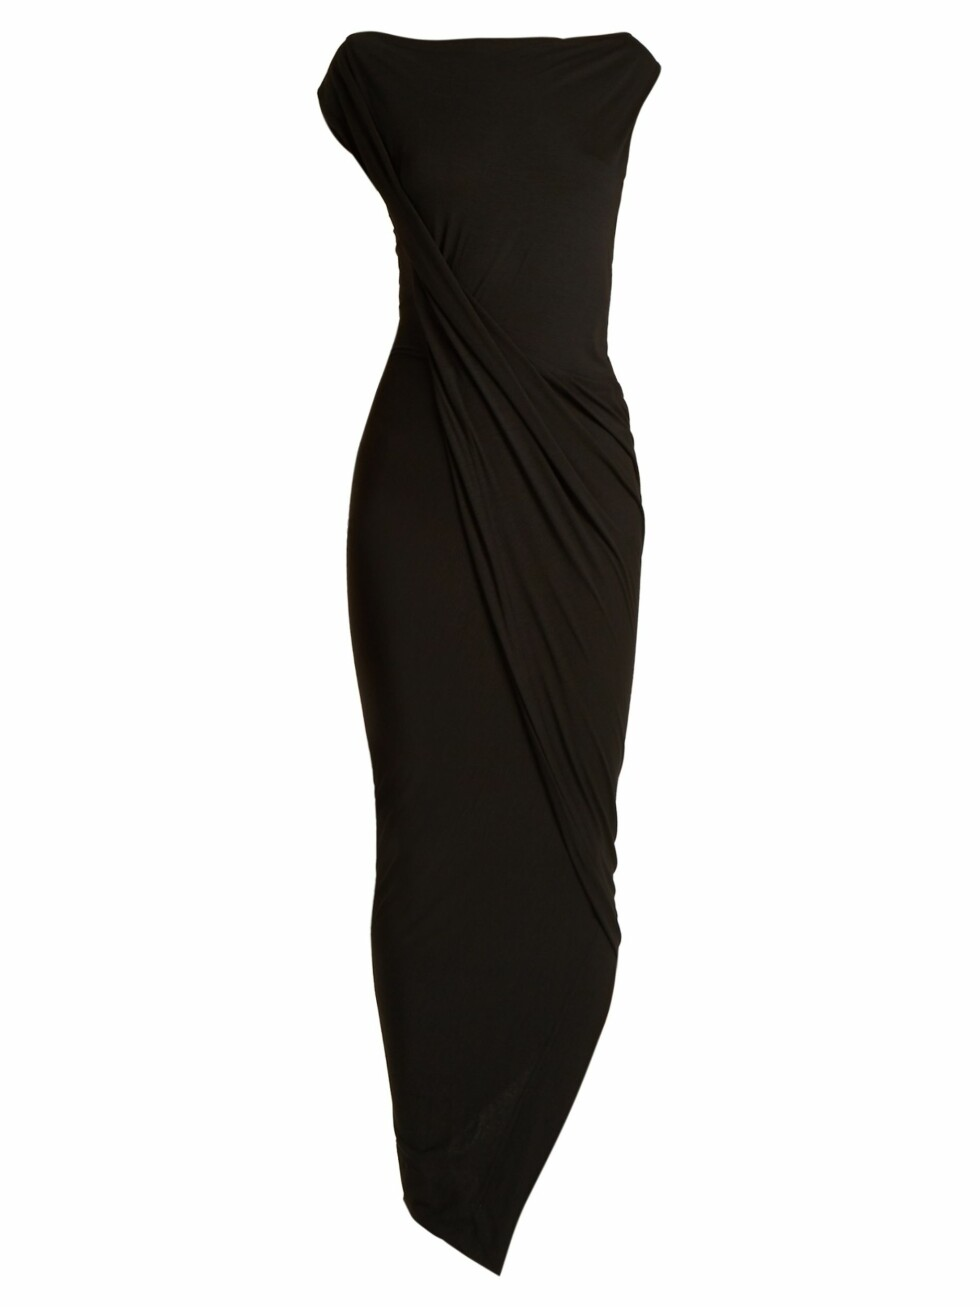 Kjole fra Vivienne Westwood via Matchesfashion.com |2665,-| https://www.matchesfashion.com/intl/products/Vivienne-Westwood-Anglomania-Vian-draped-front-jersey-dress-1188109